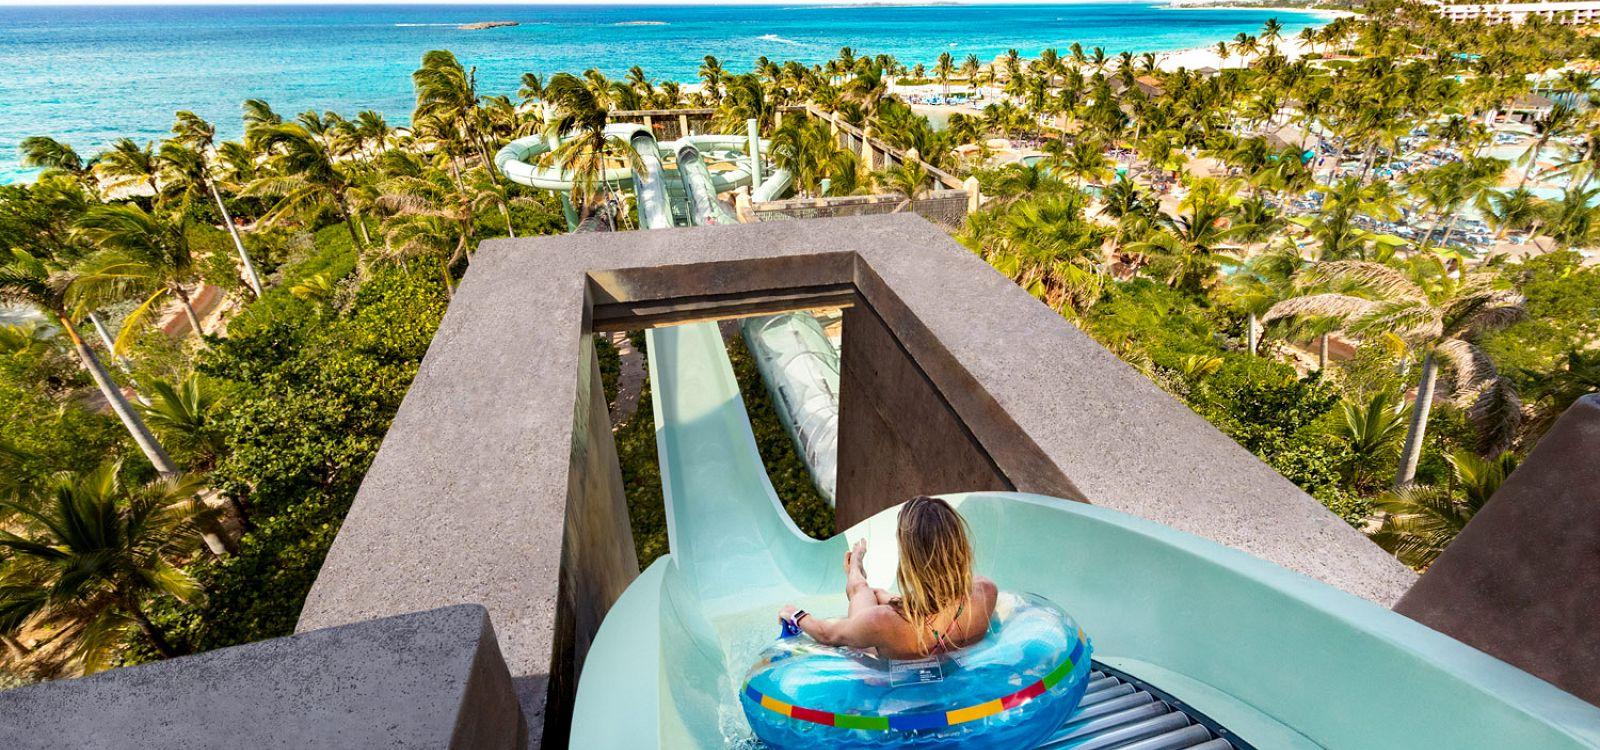 Water Slides at Aquaventure Bahamas | Atlantis Paradise Island